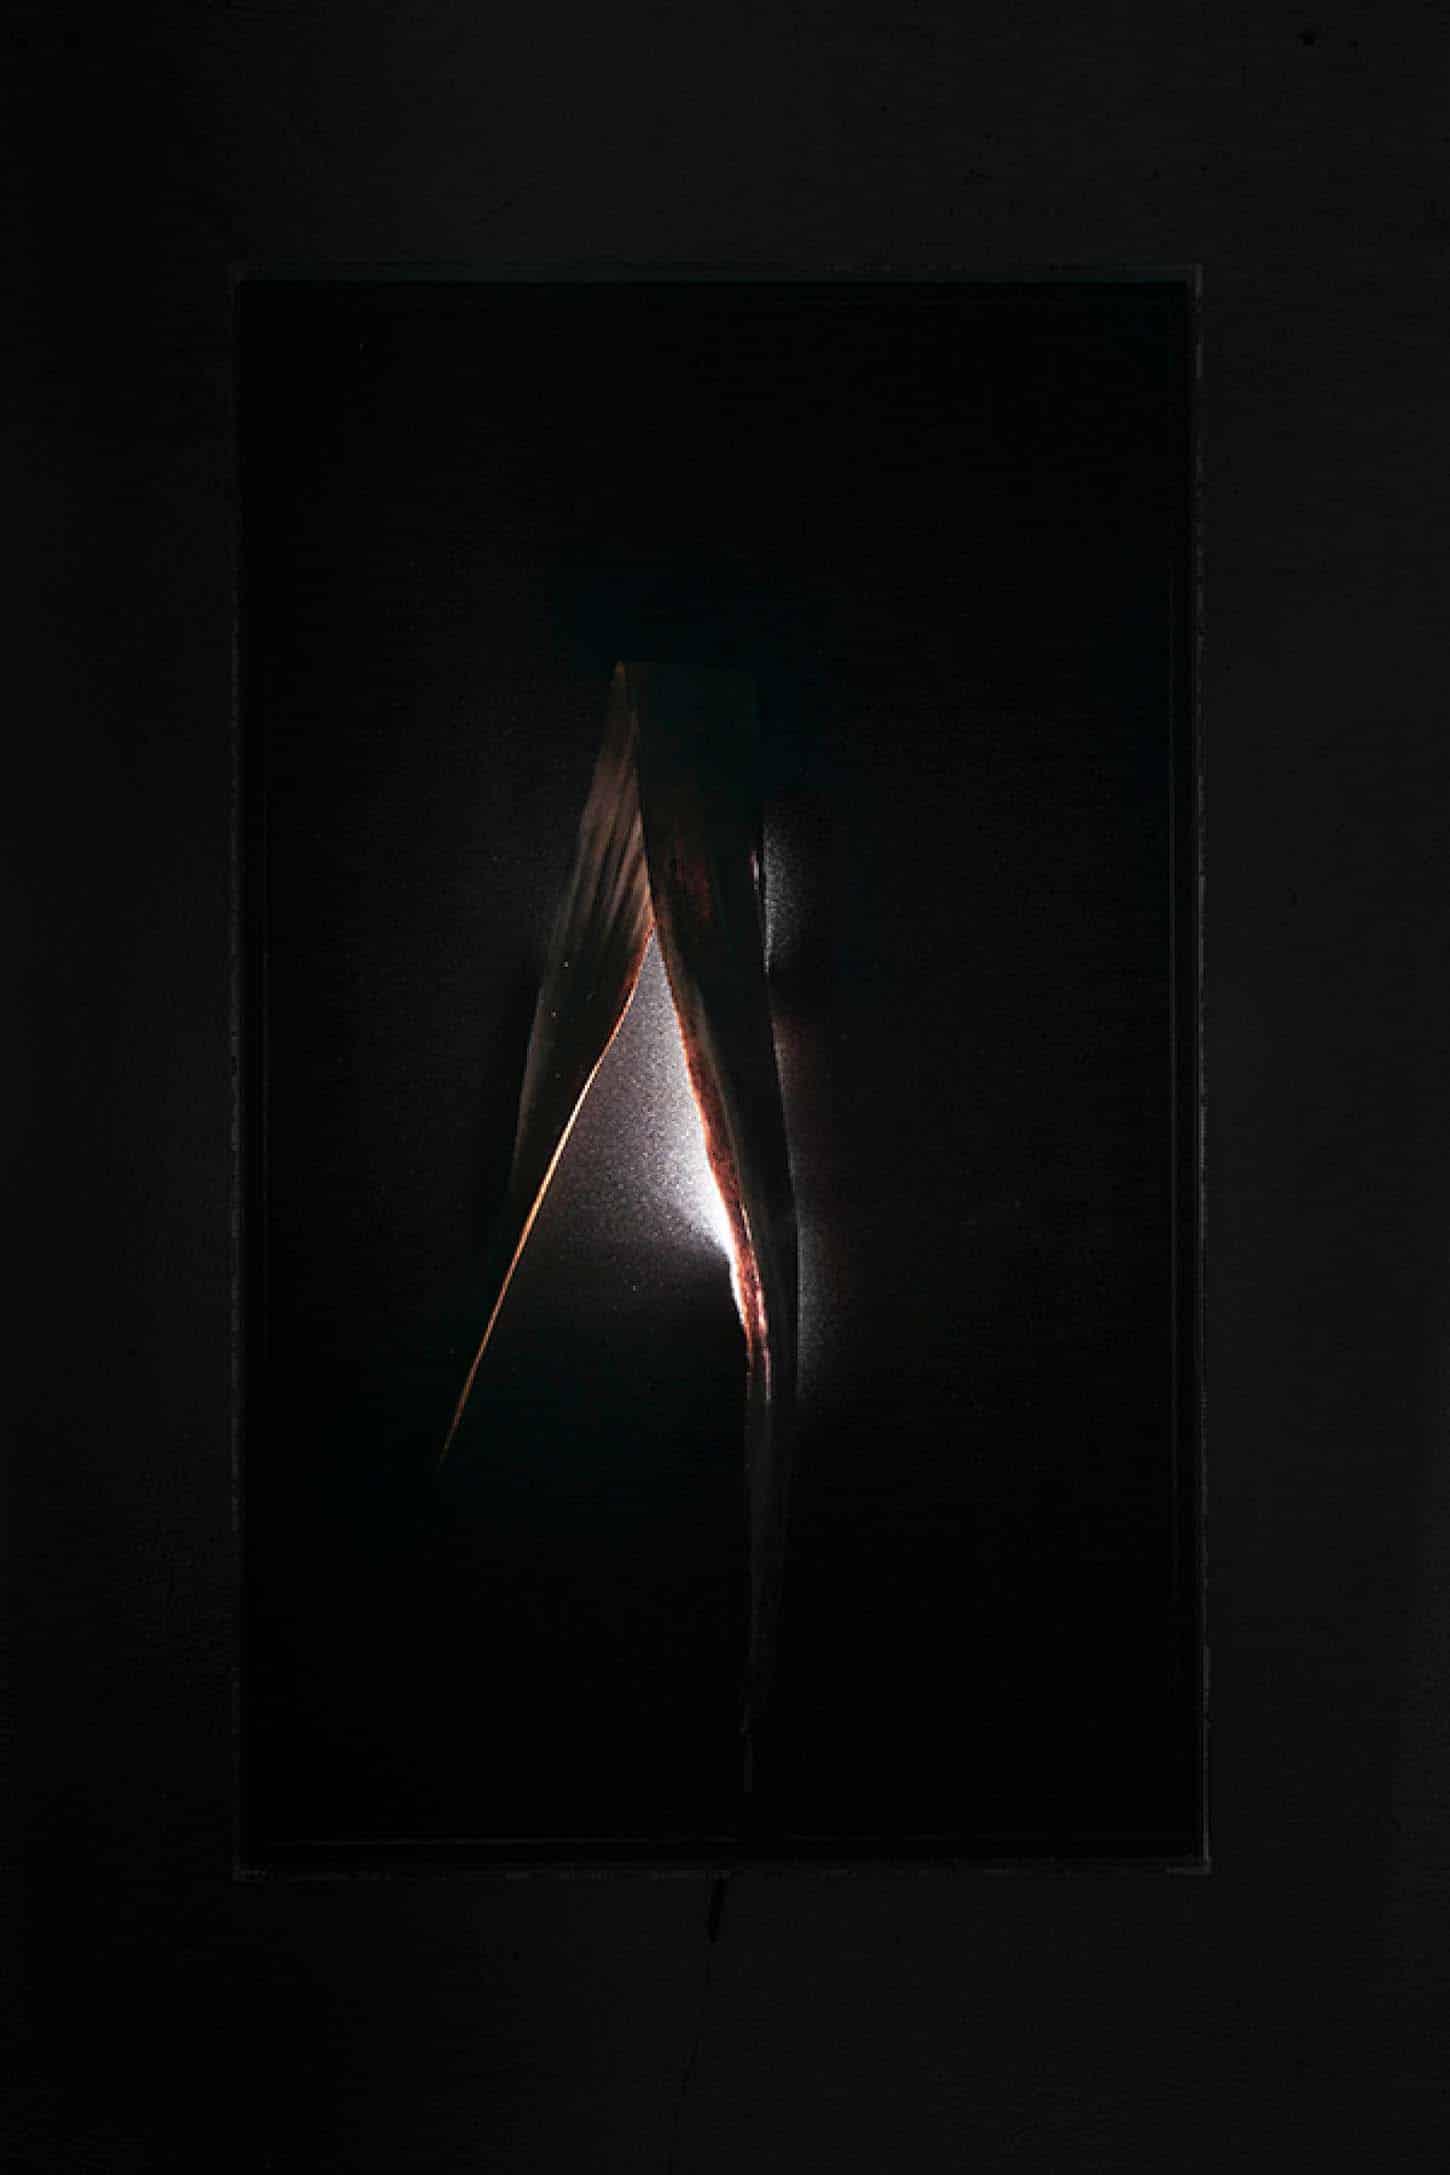 Espace A VENDRE. Eva Medin - SolsticeYuca 1Mousse, feuille de yuka, dispositif lumineux,cadre en plexiglas